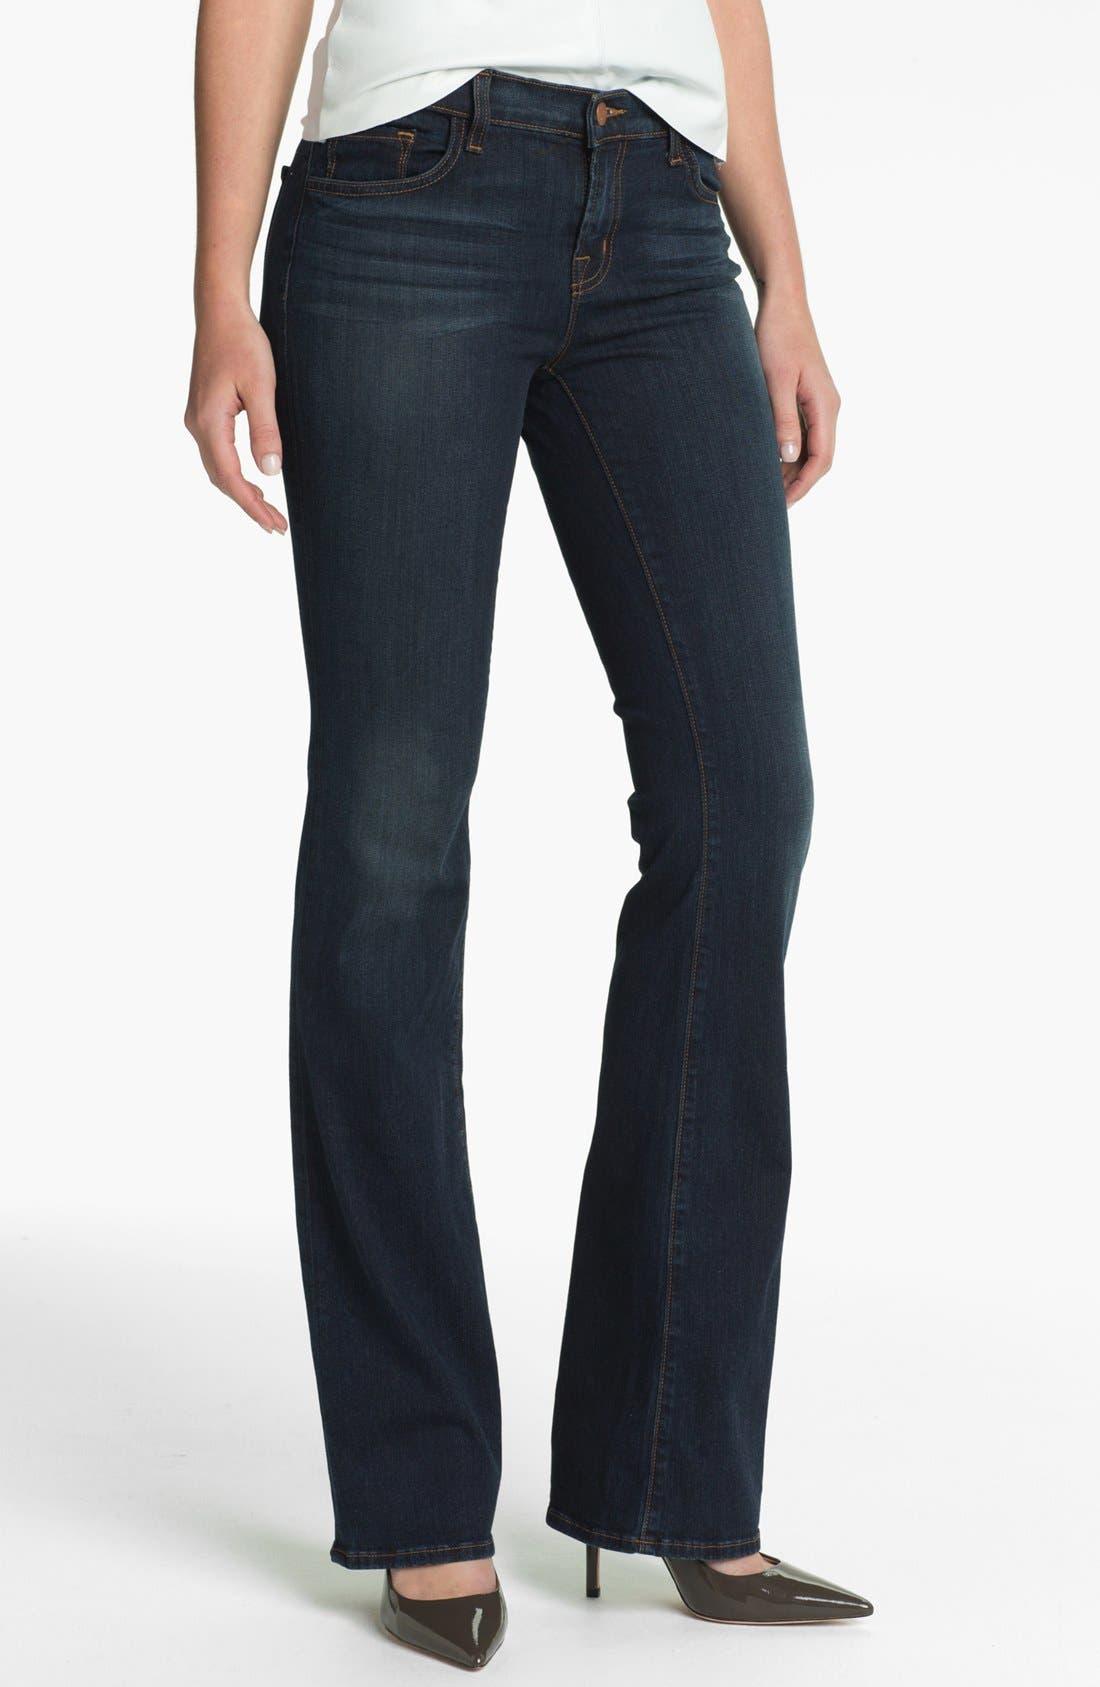 Alternate Image 1 Selected - J Brand Slim Bootcut Jeans (Veruca)